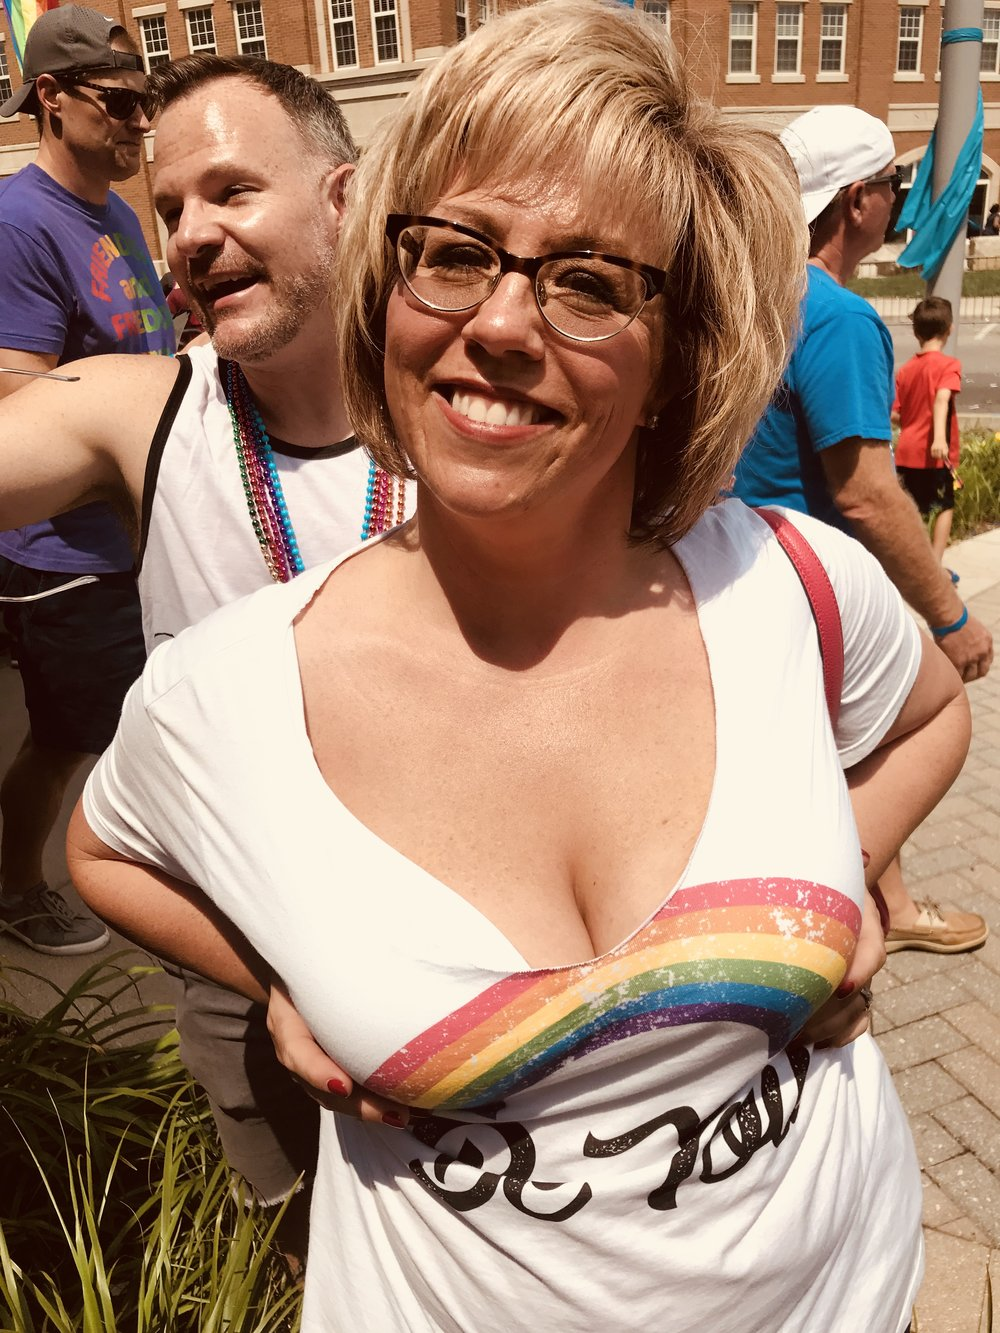 Lisa is beaming with rainbow pride